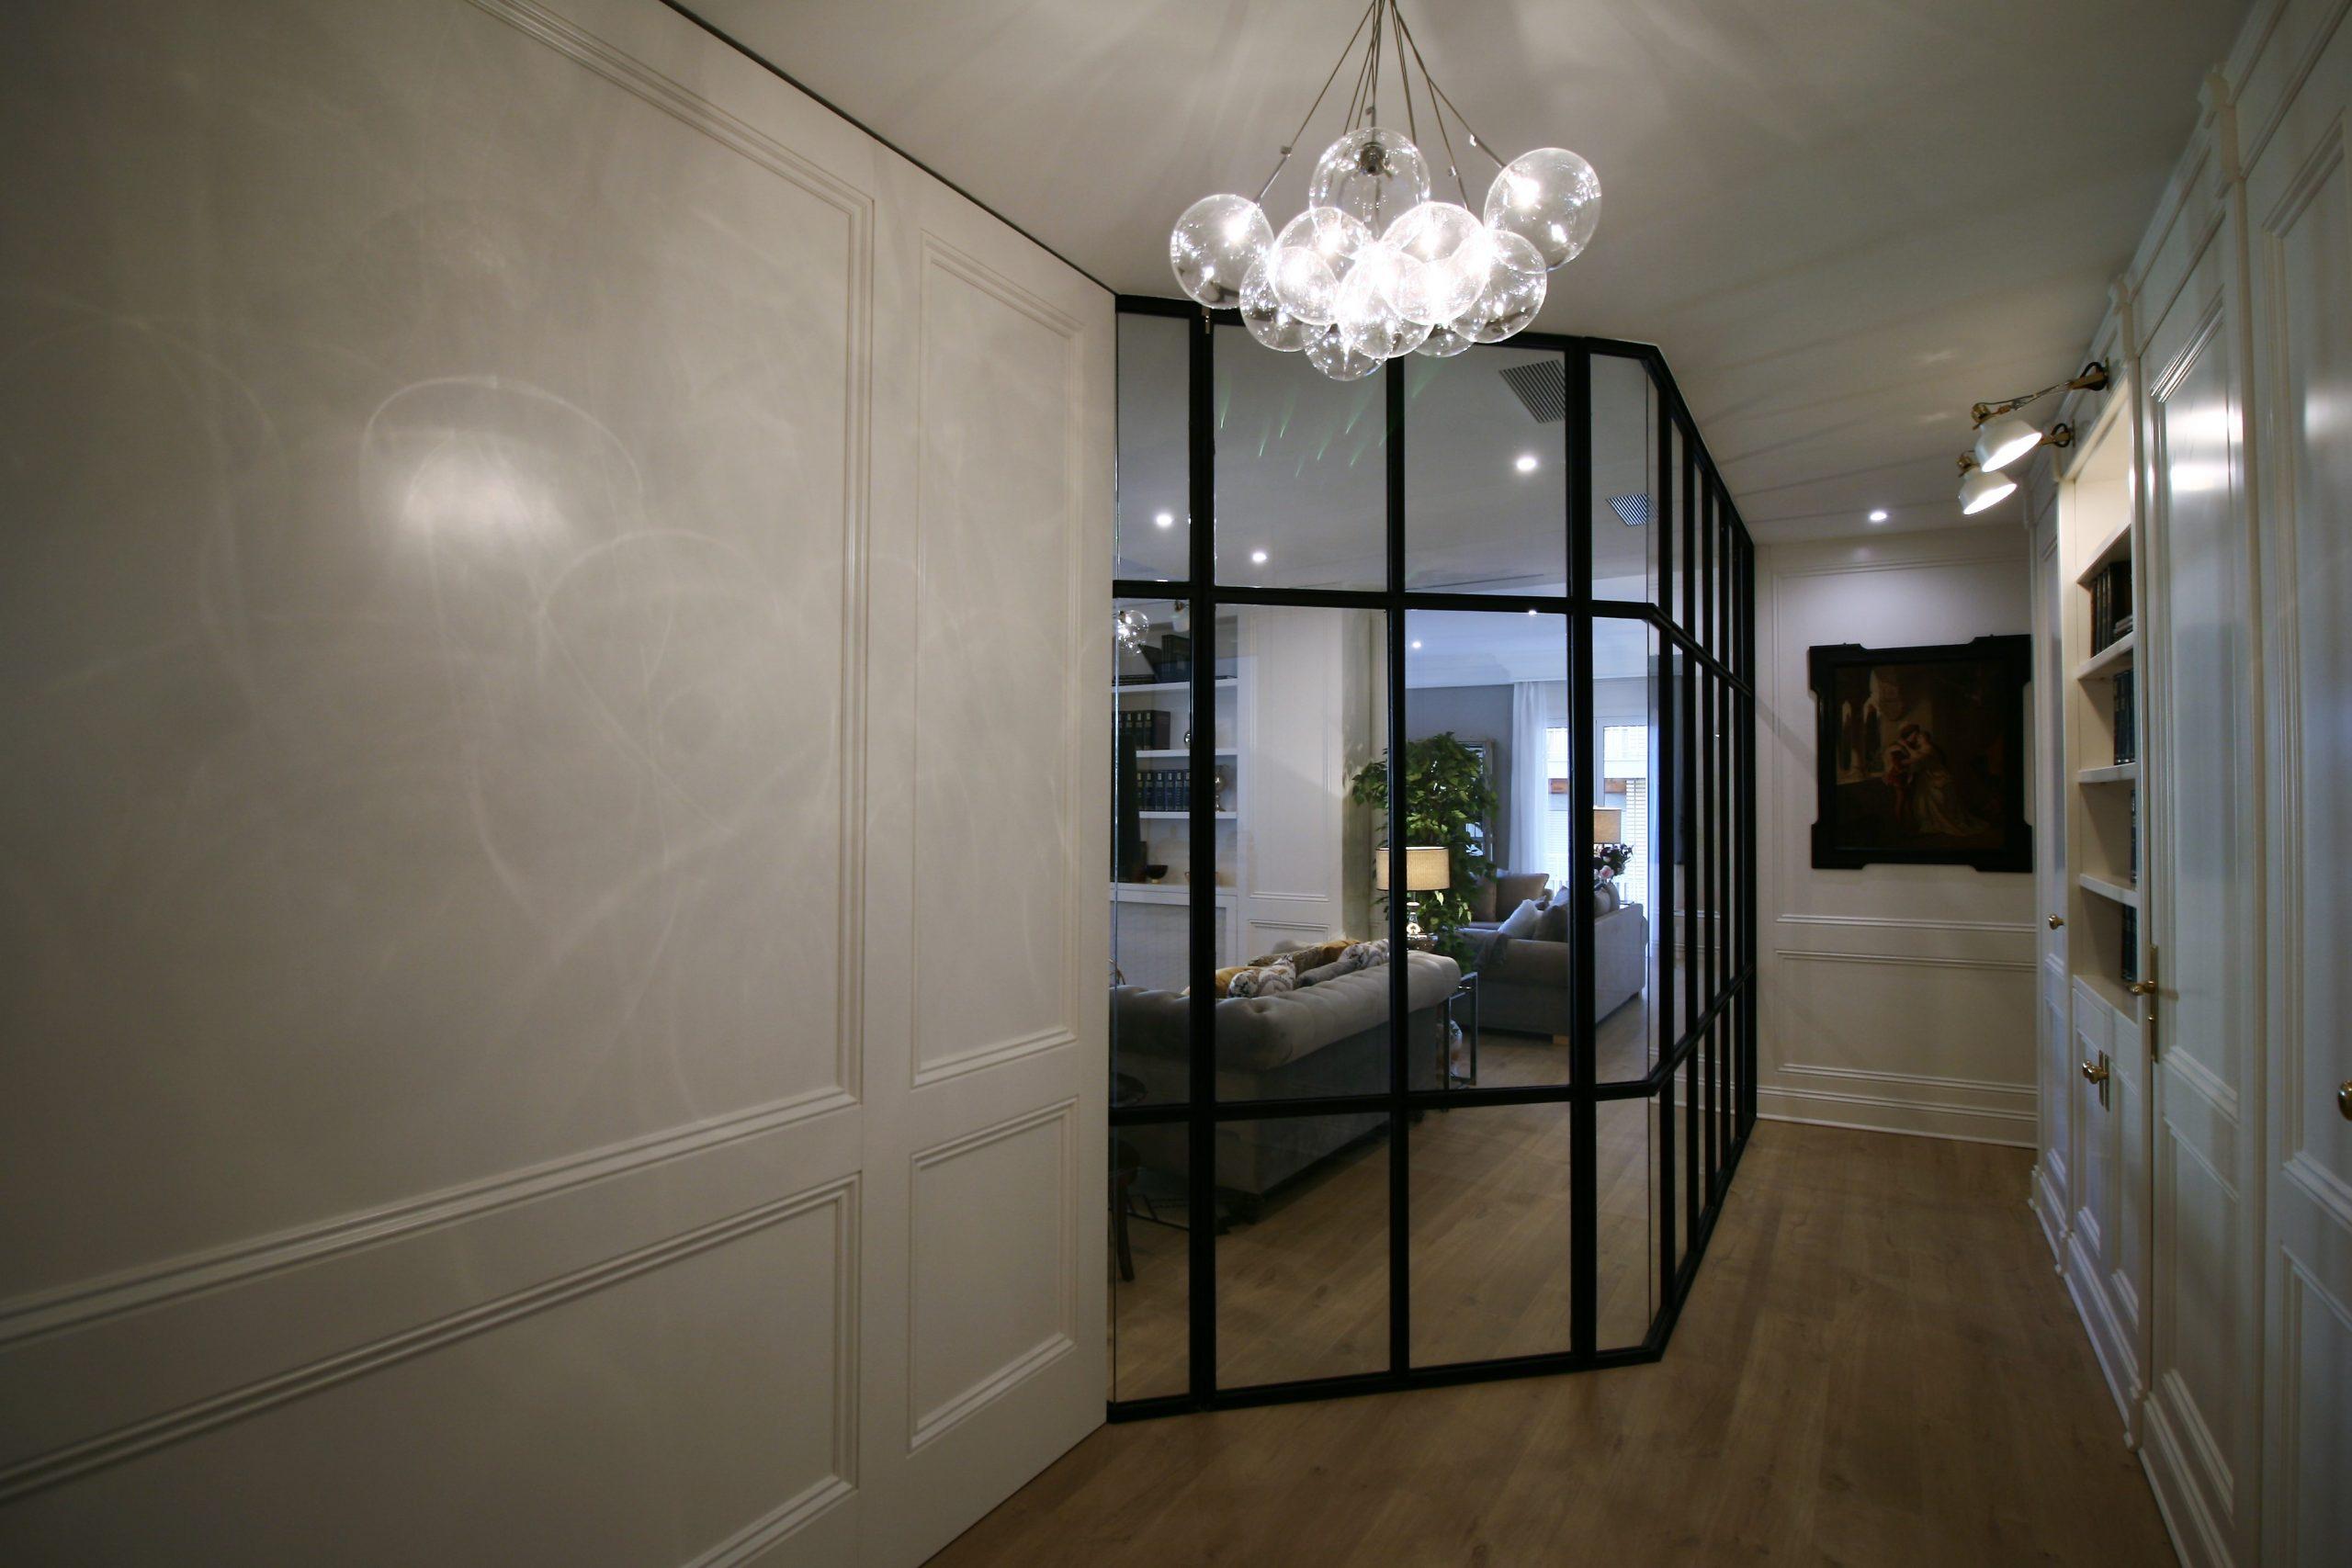 vivienda-puerta-vidrio